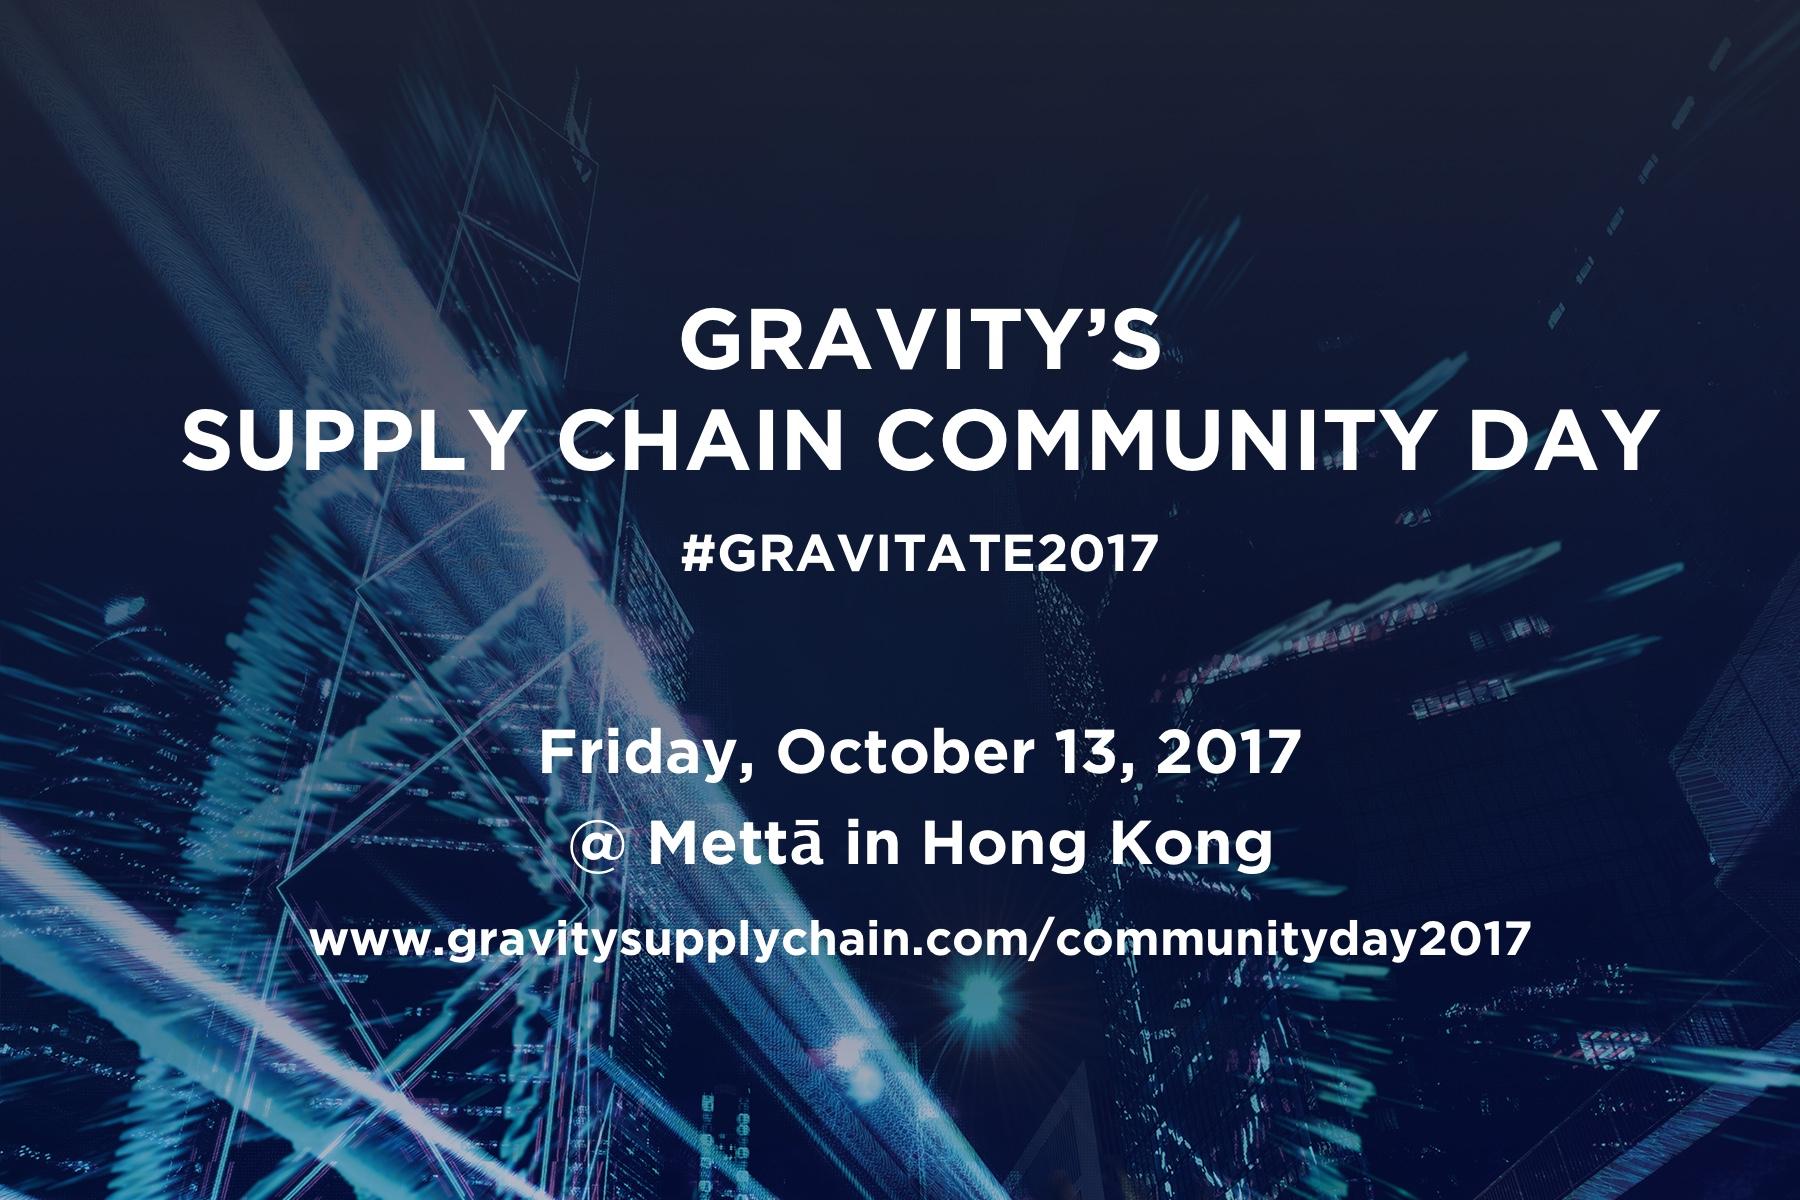 Gravity's Supply Chain Community Day - Gravitate 2017